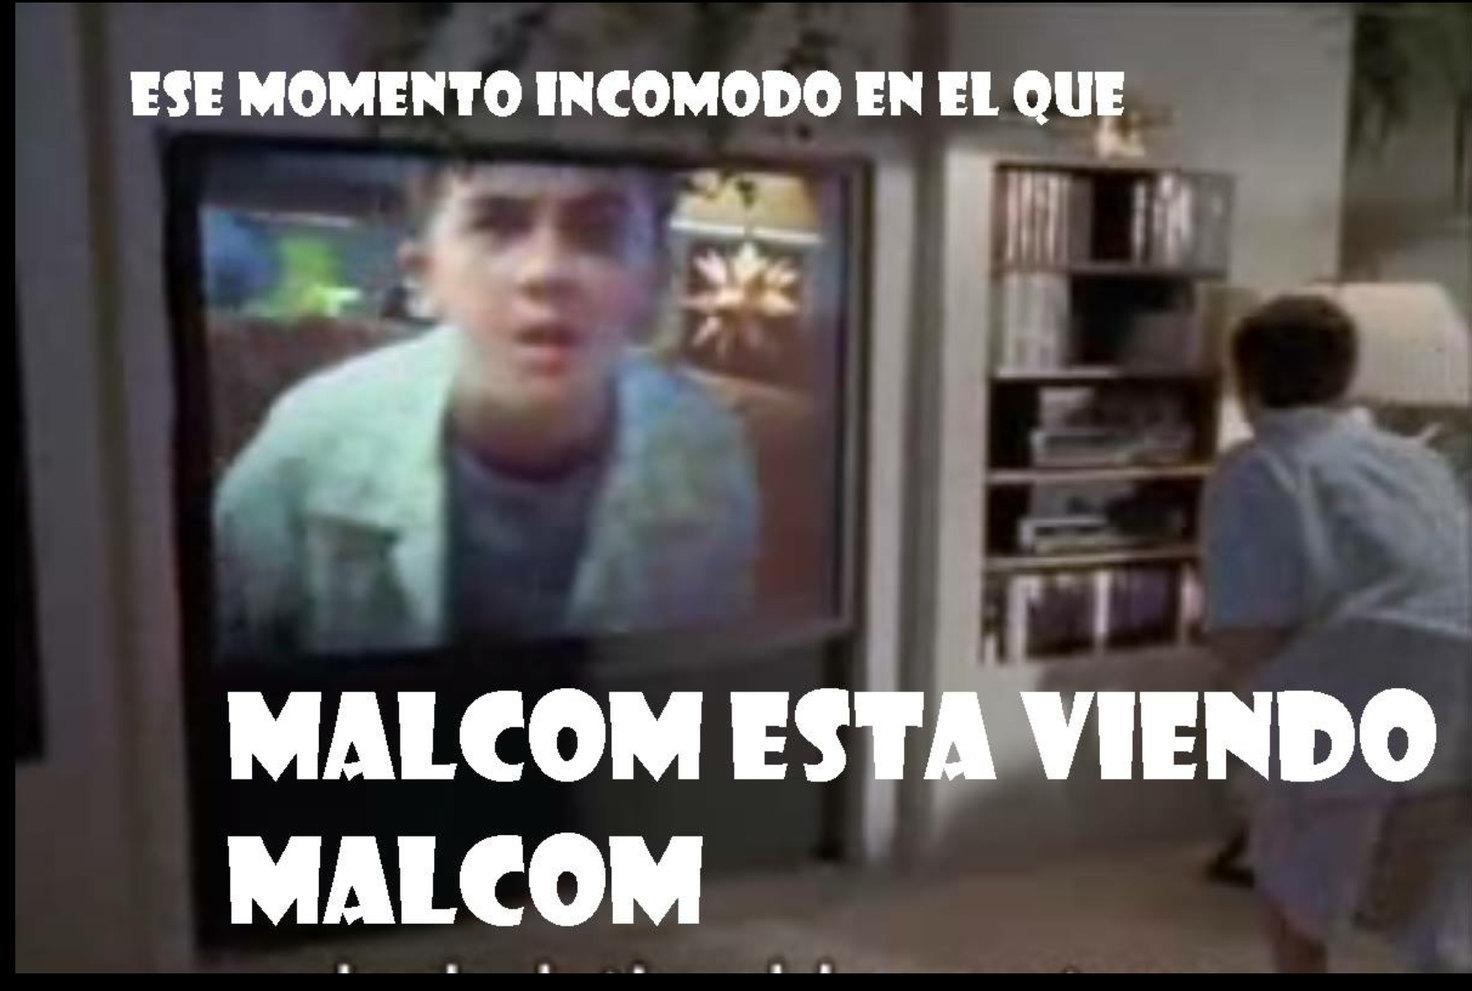 Malcom xd - meme